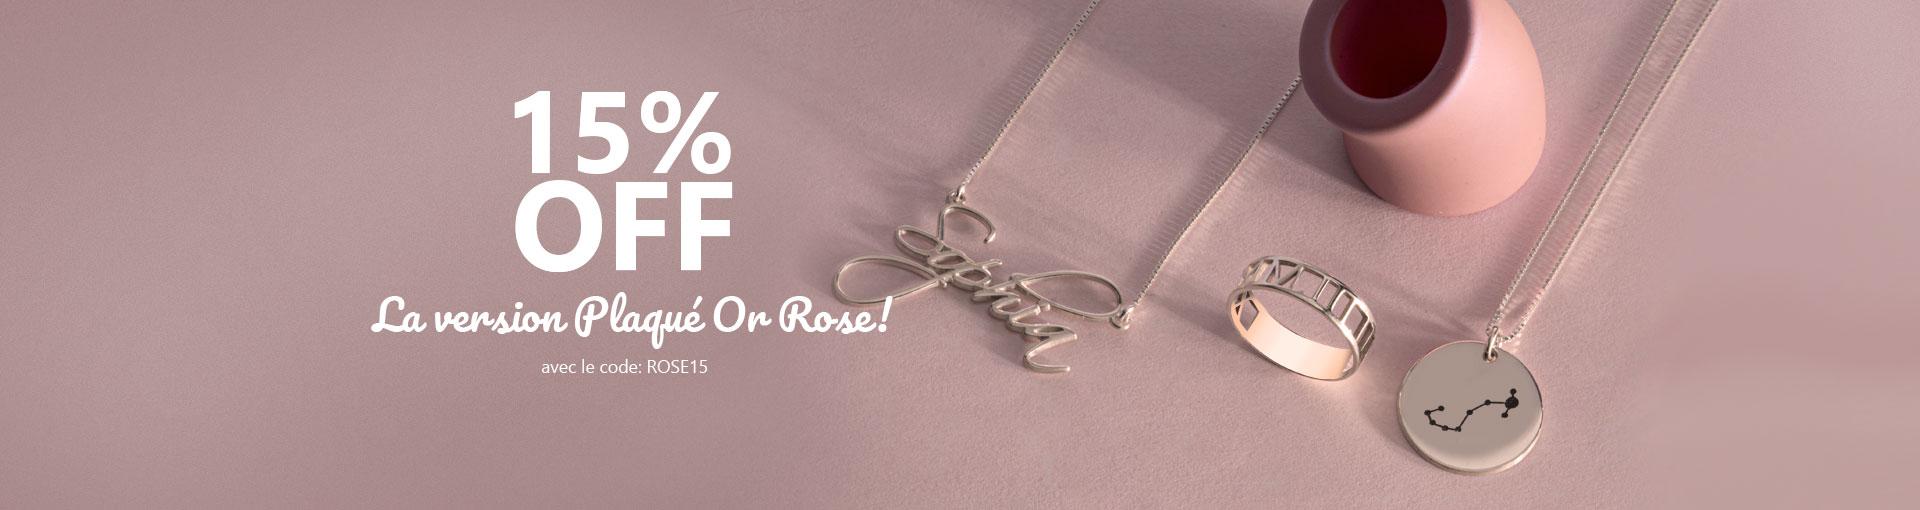 Vente Plaqué Or Rose - Banner